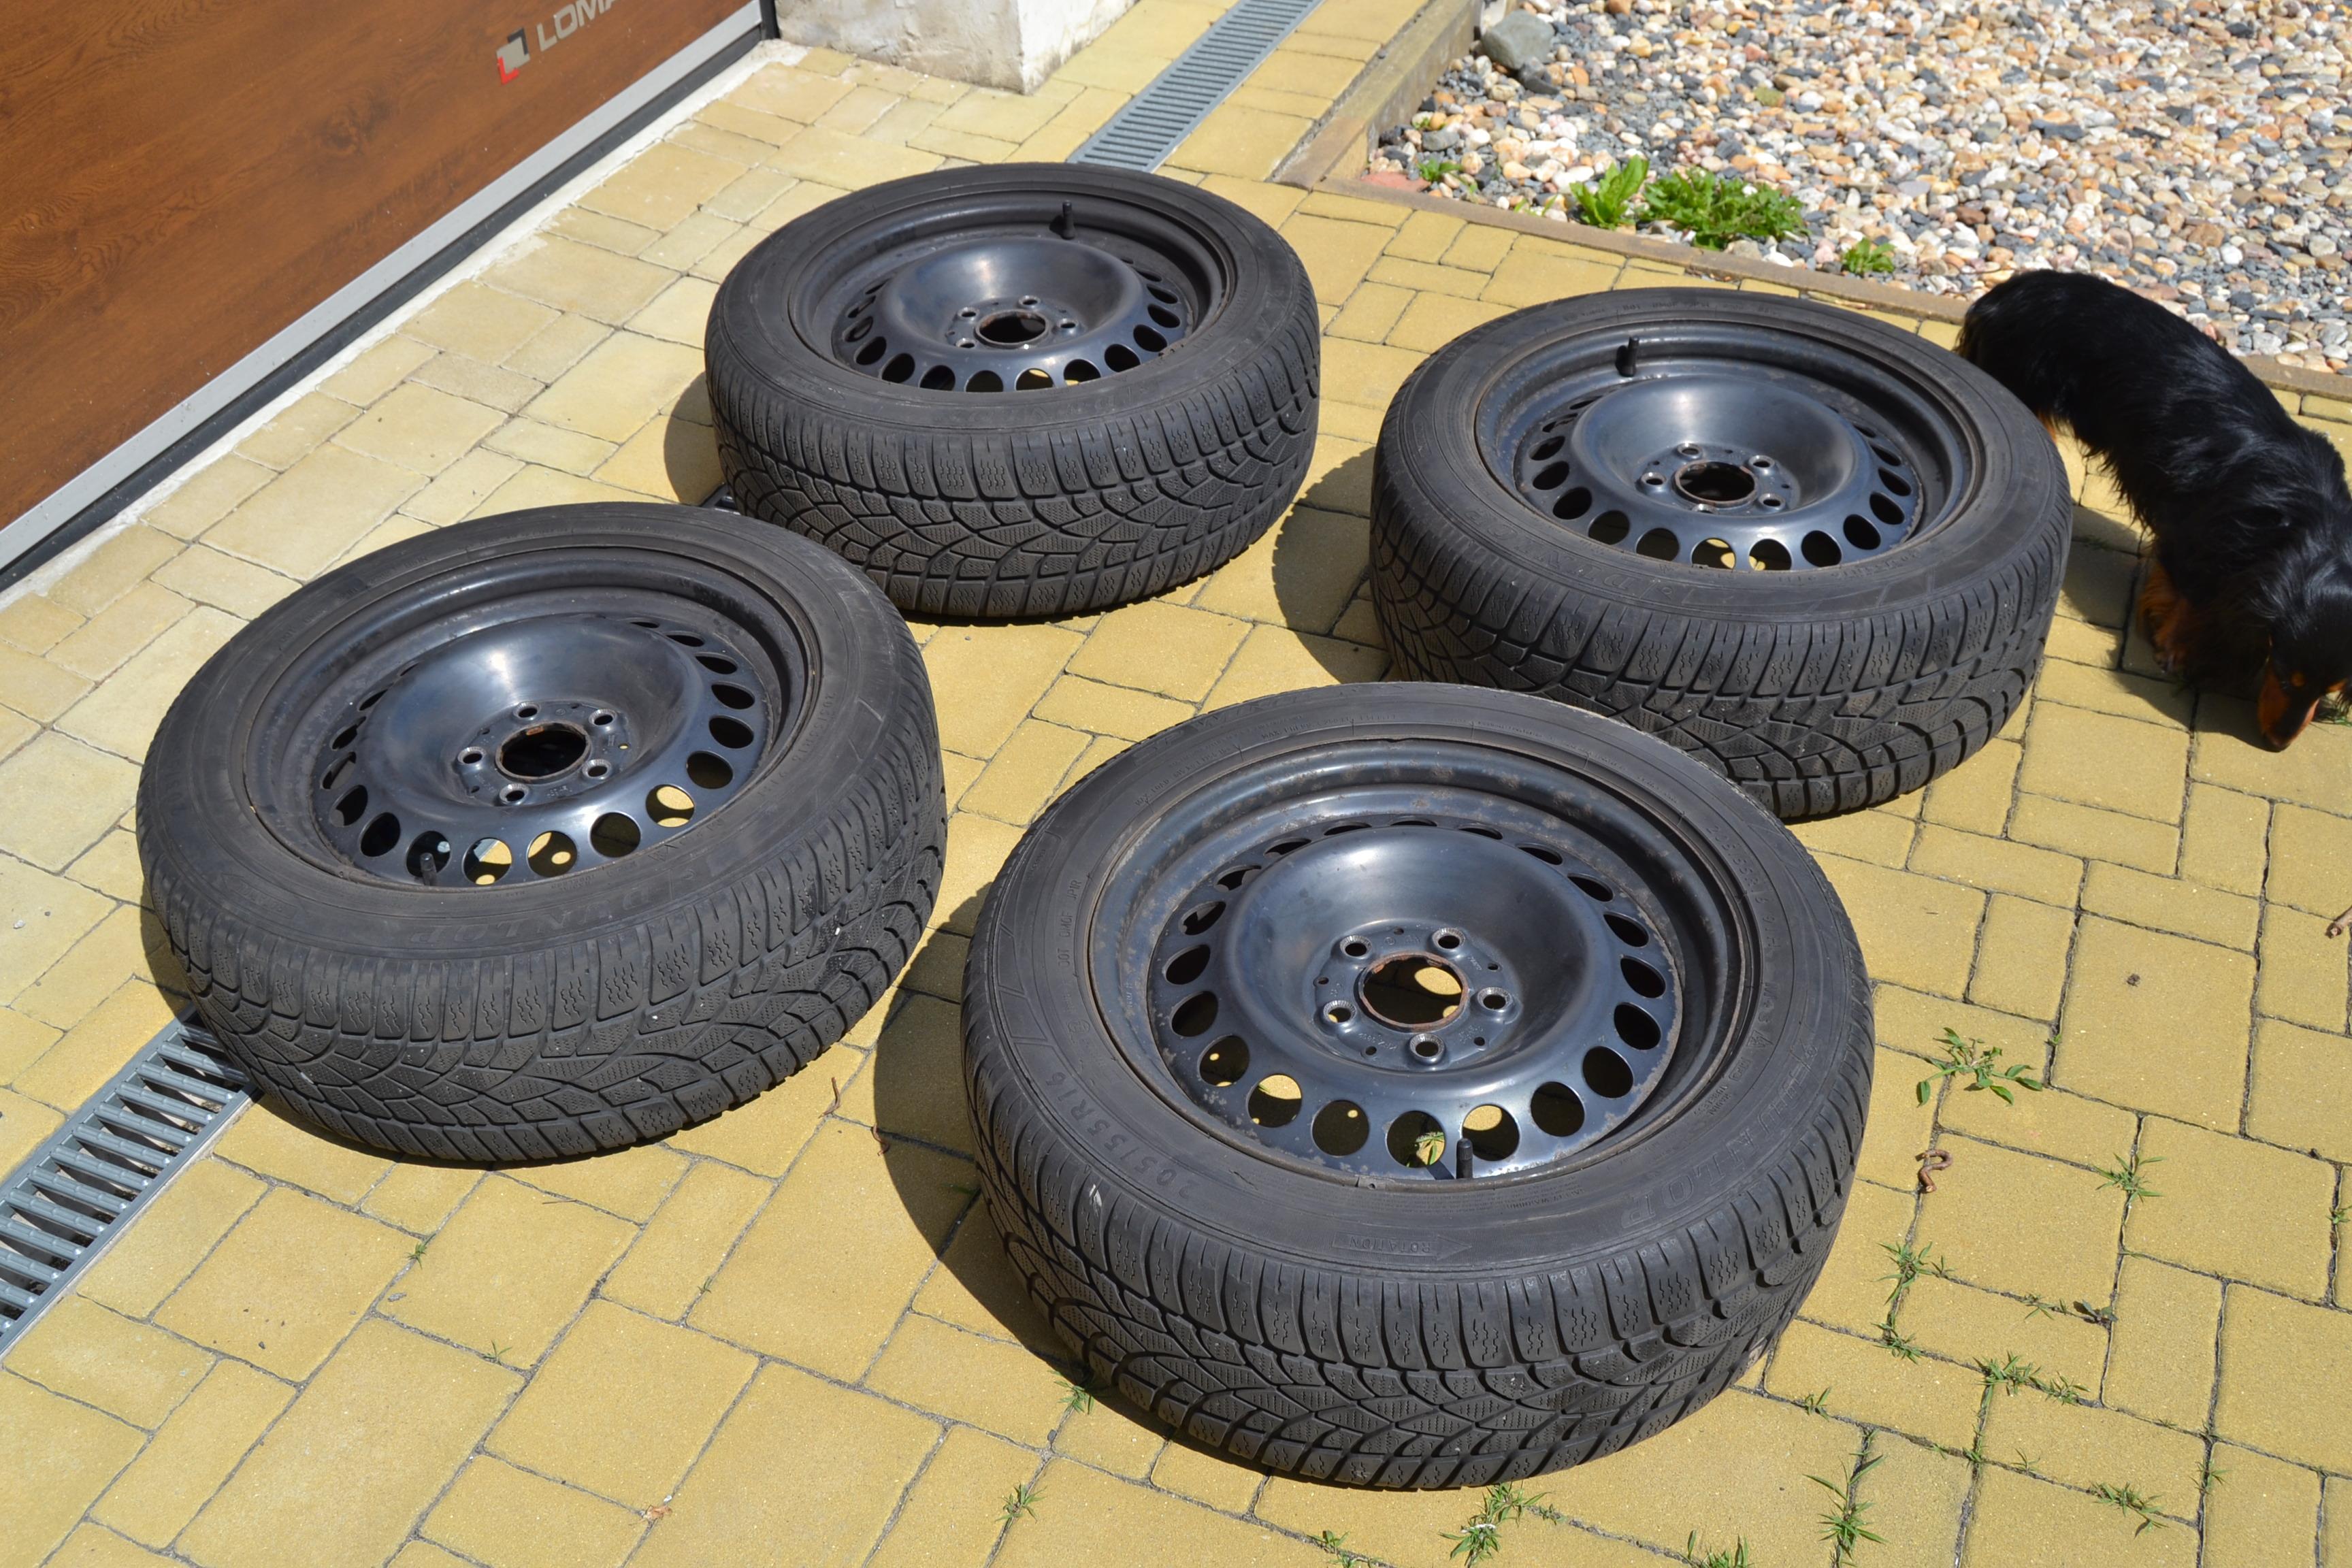 dunlop winter sport 3d 205 55 r16 pneu s disky angelicaaudio 1990. Black Bedroom Furniture Sets. Home Design Ideas